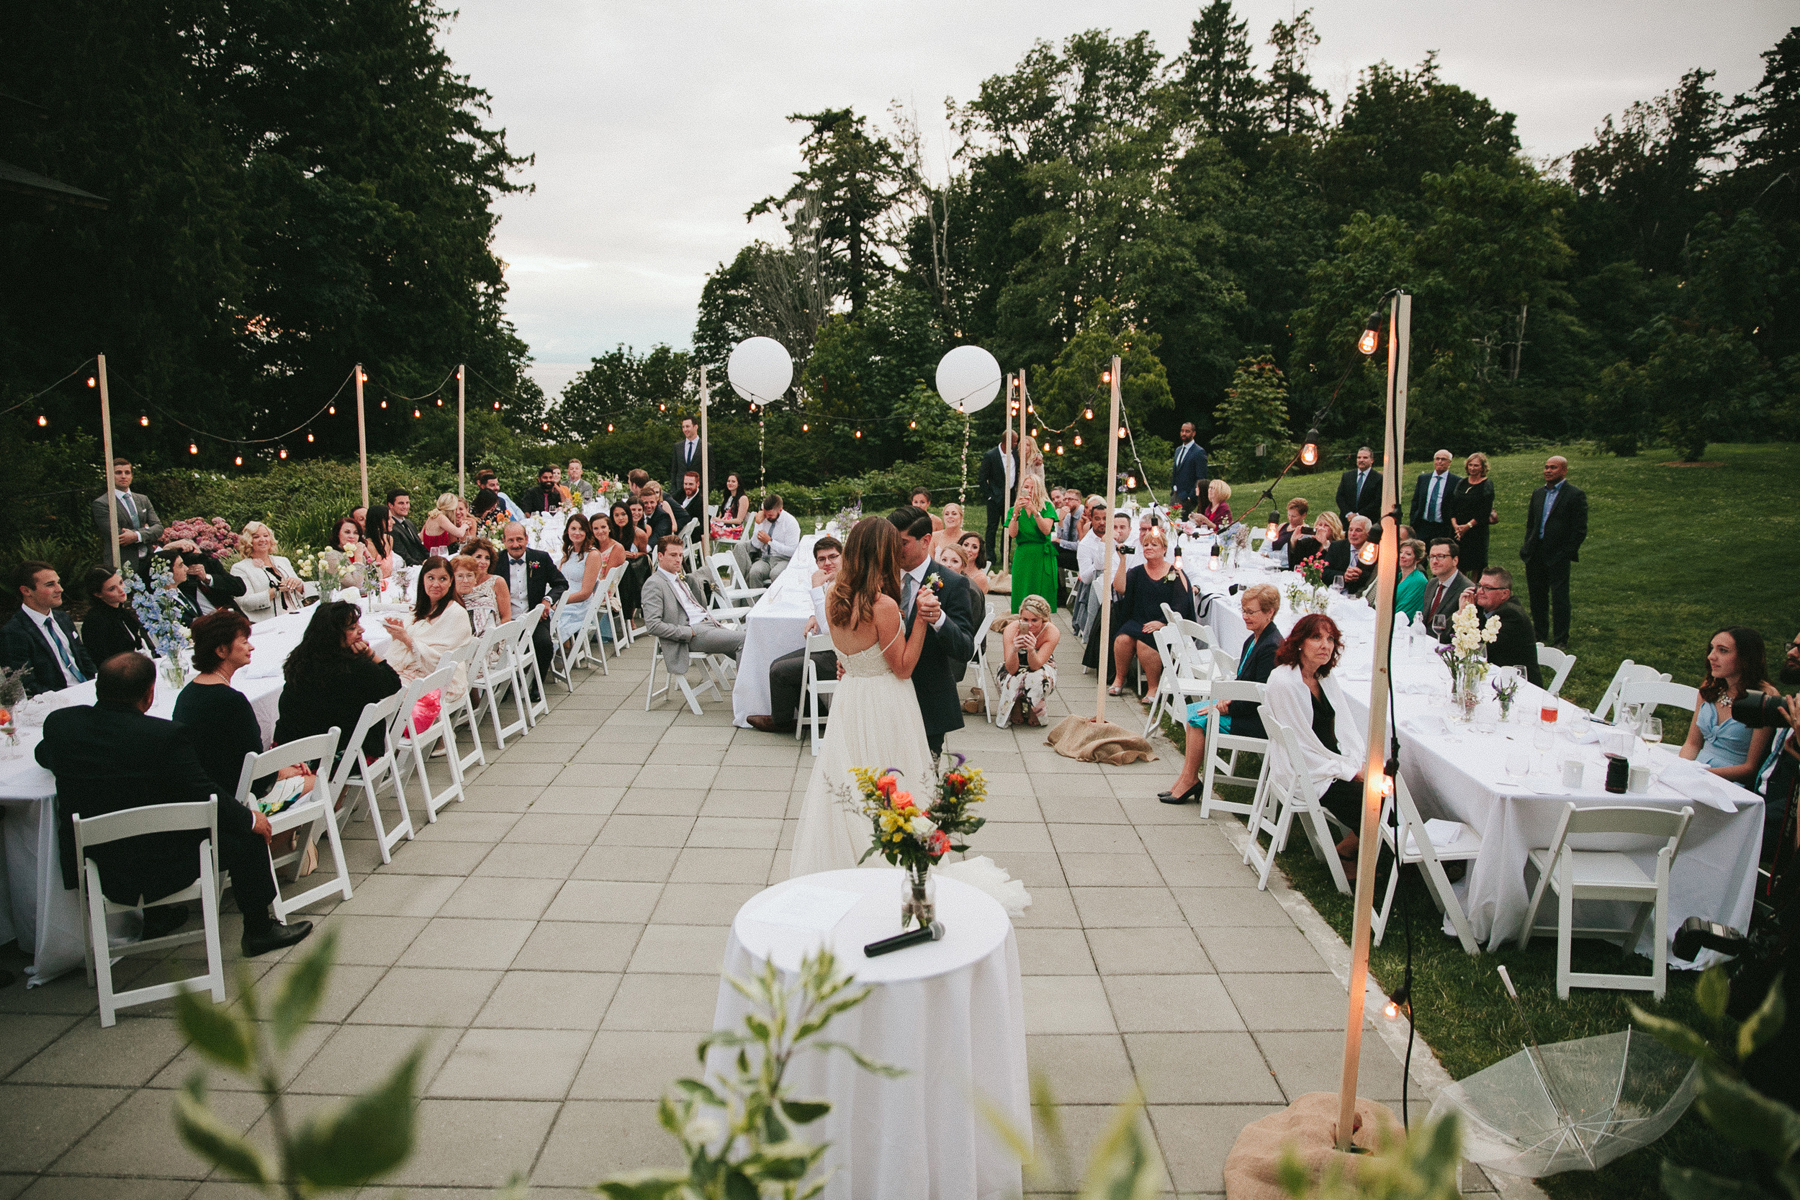 UBC-Botanical-Garden-Wedding-AD-139.jpg